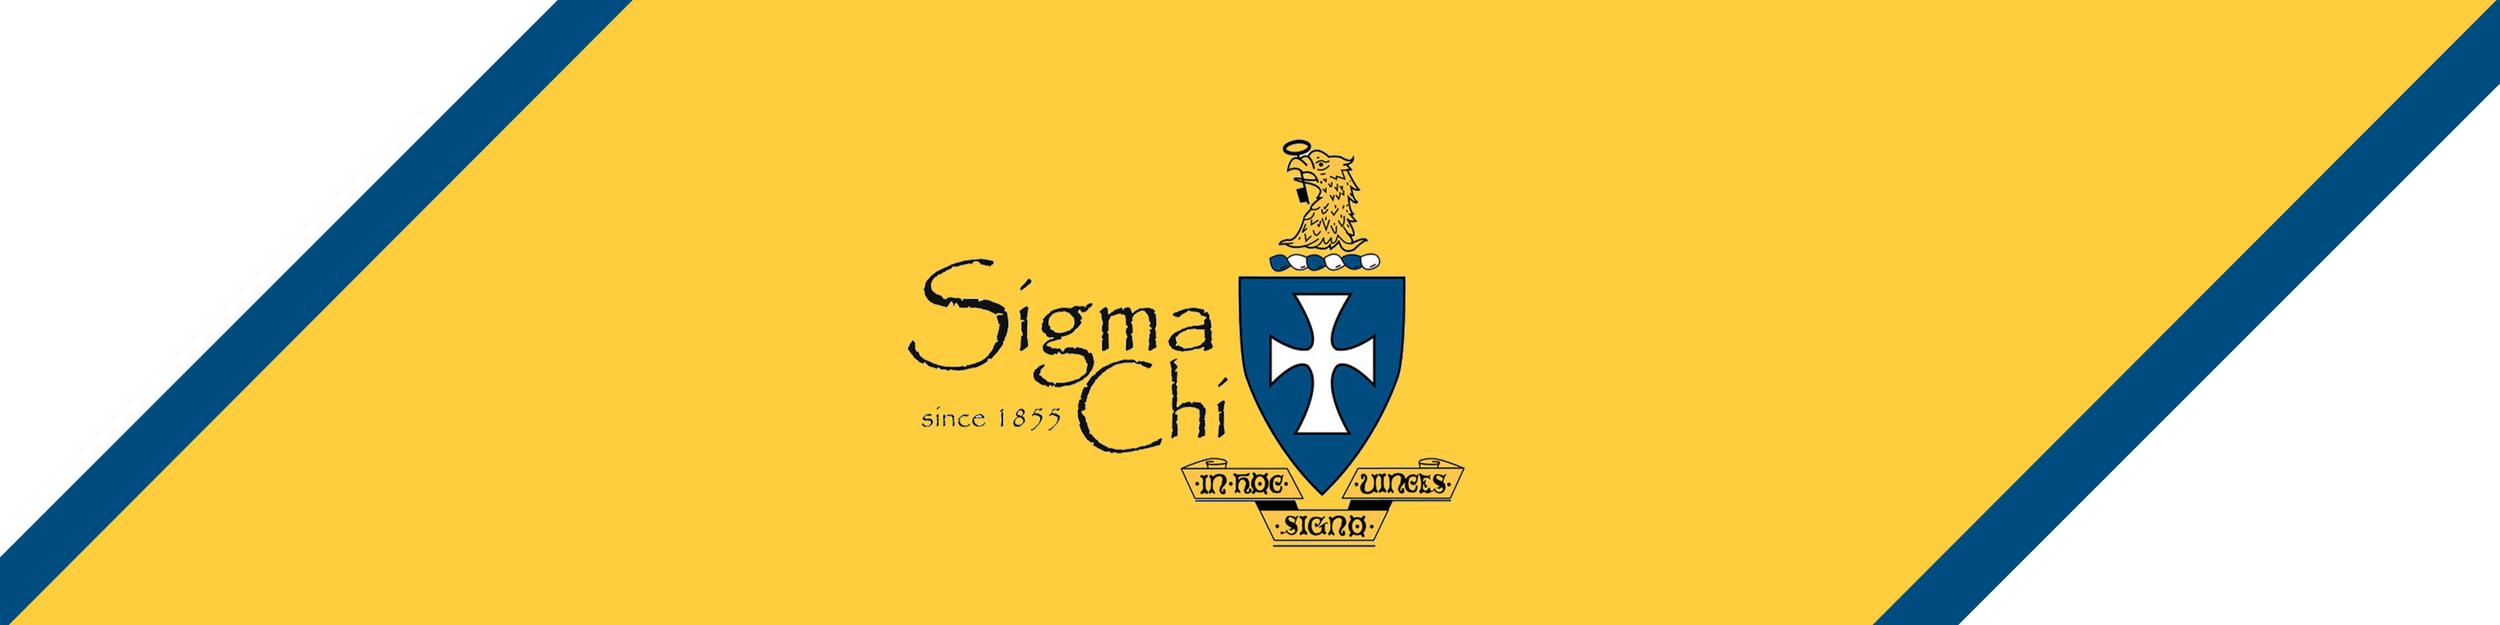 Beta Eta Chapter Of Sigma Chi